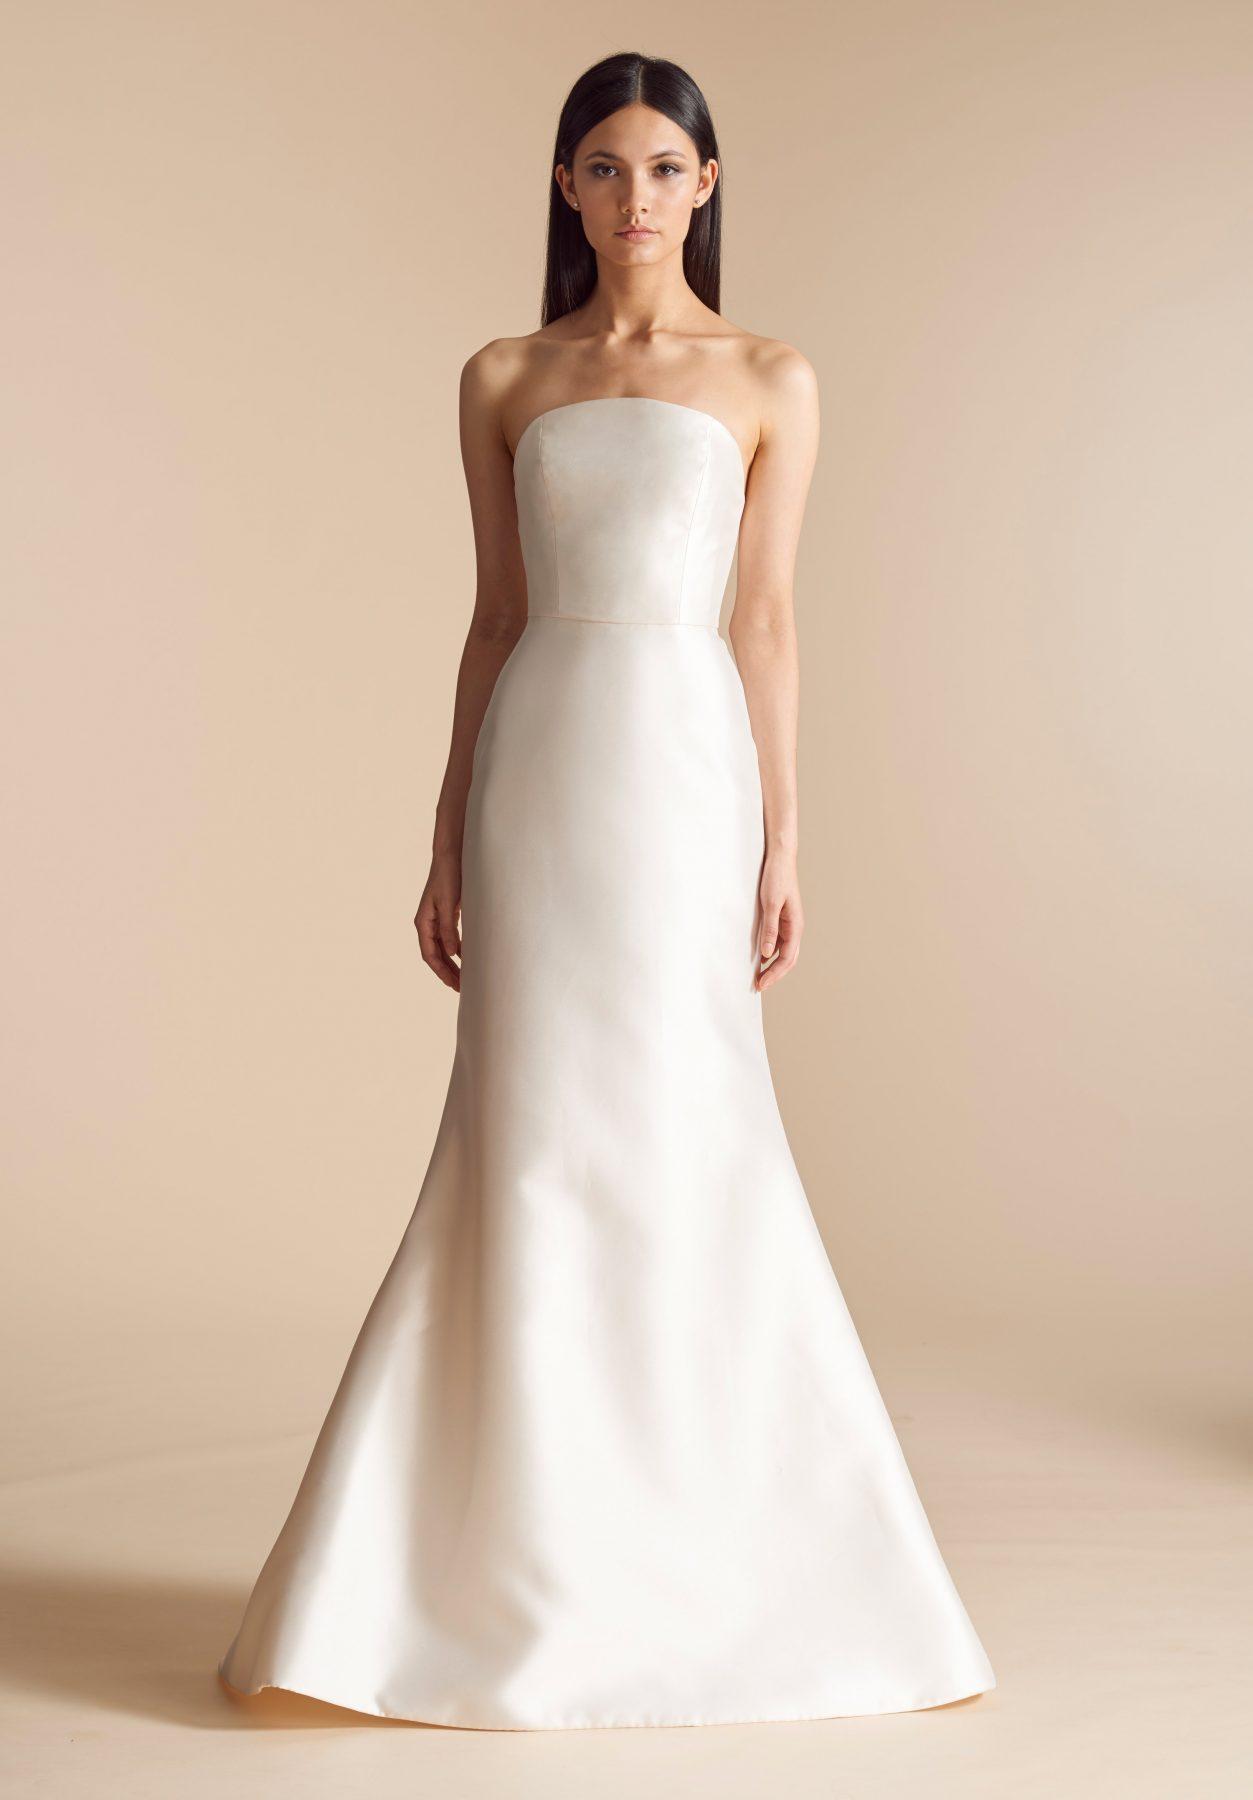 Get The Look 2019 Golden Globes Kleinfeld Bridal